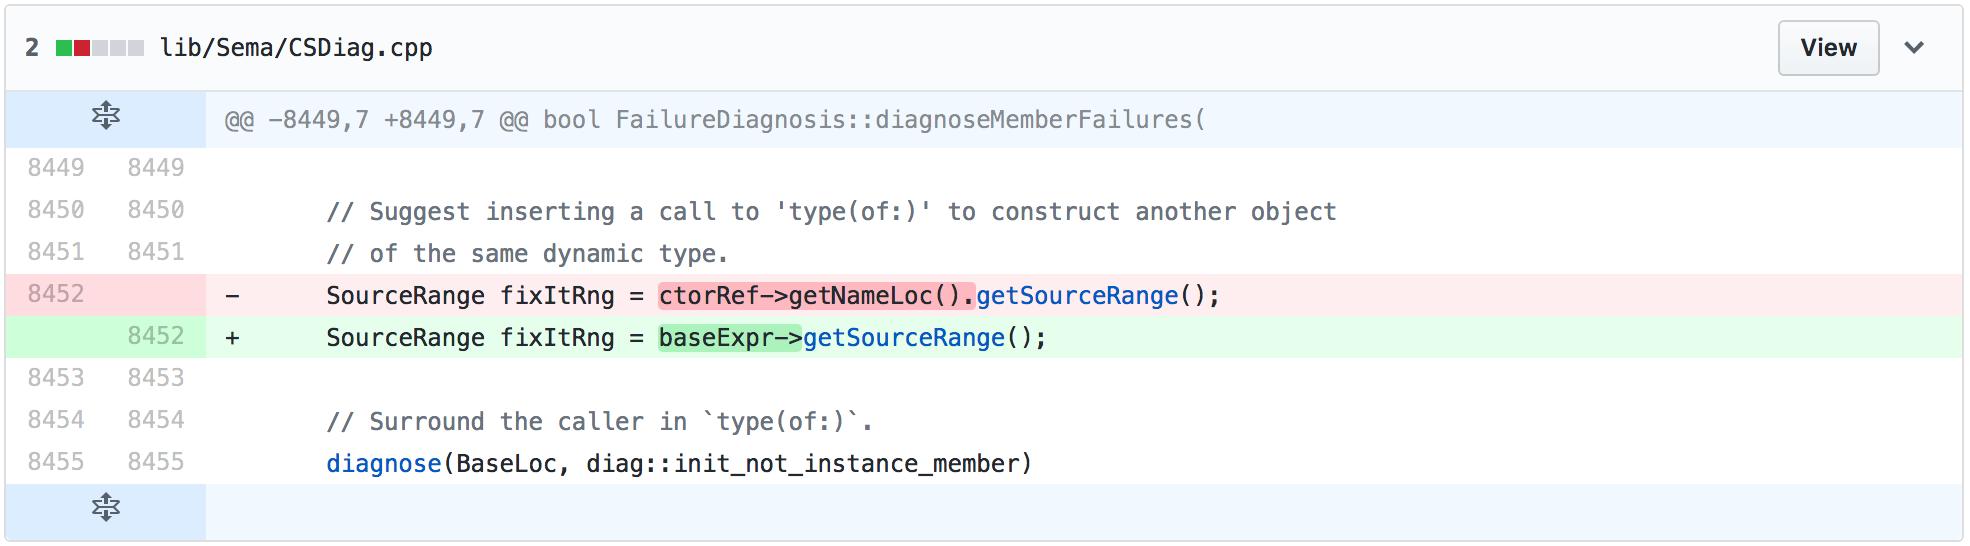 5_fixedcode.png